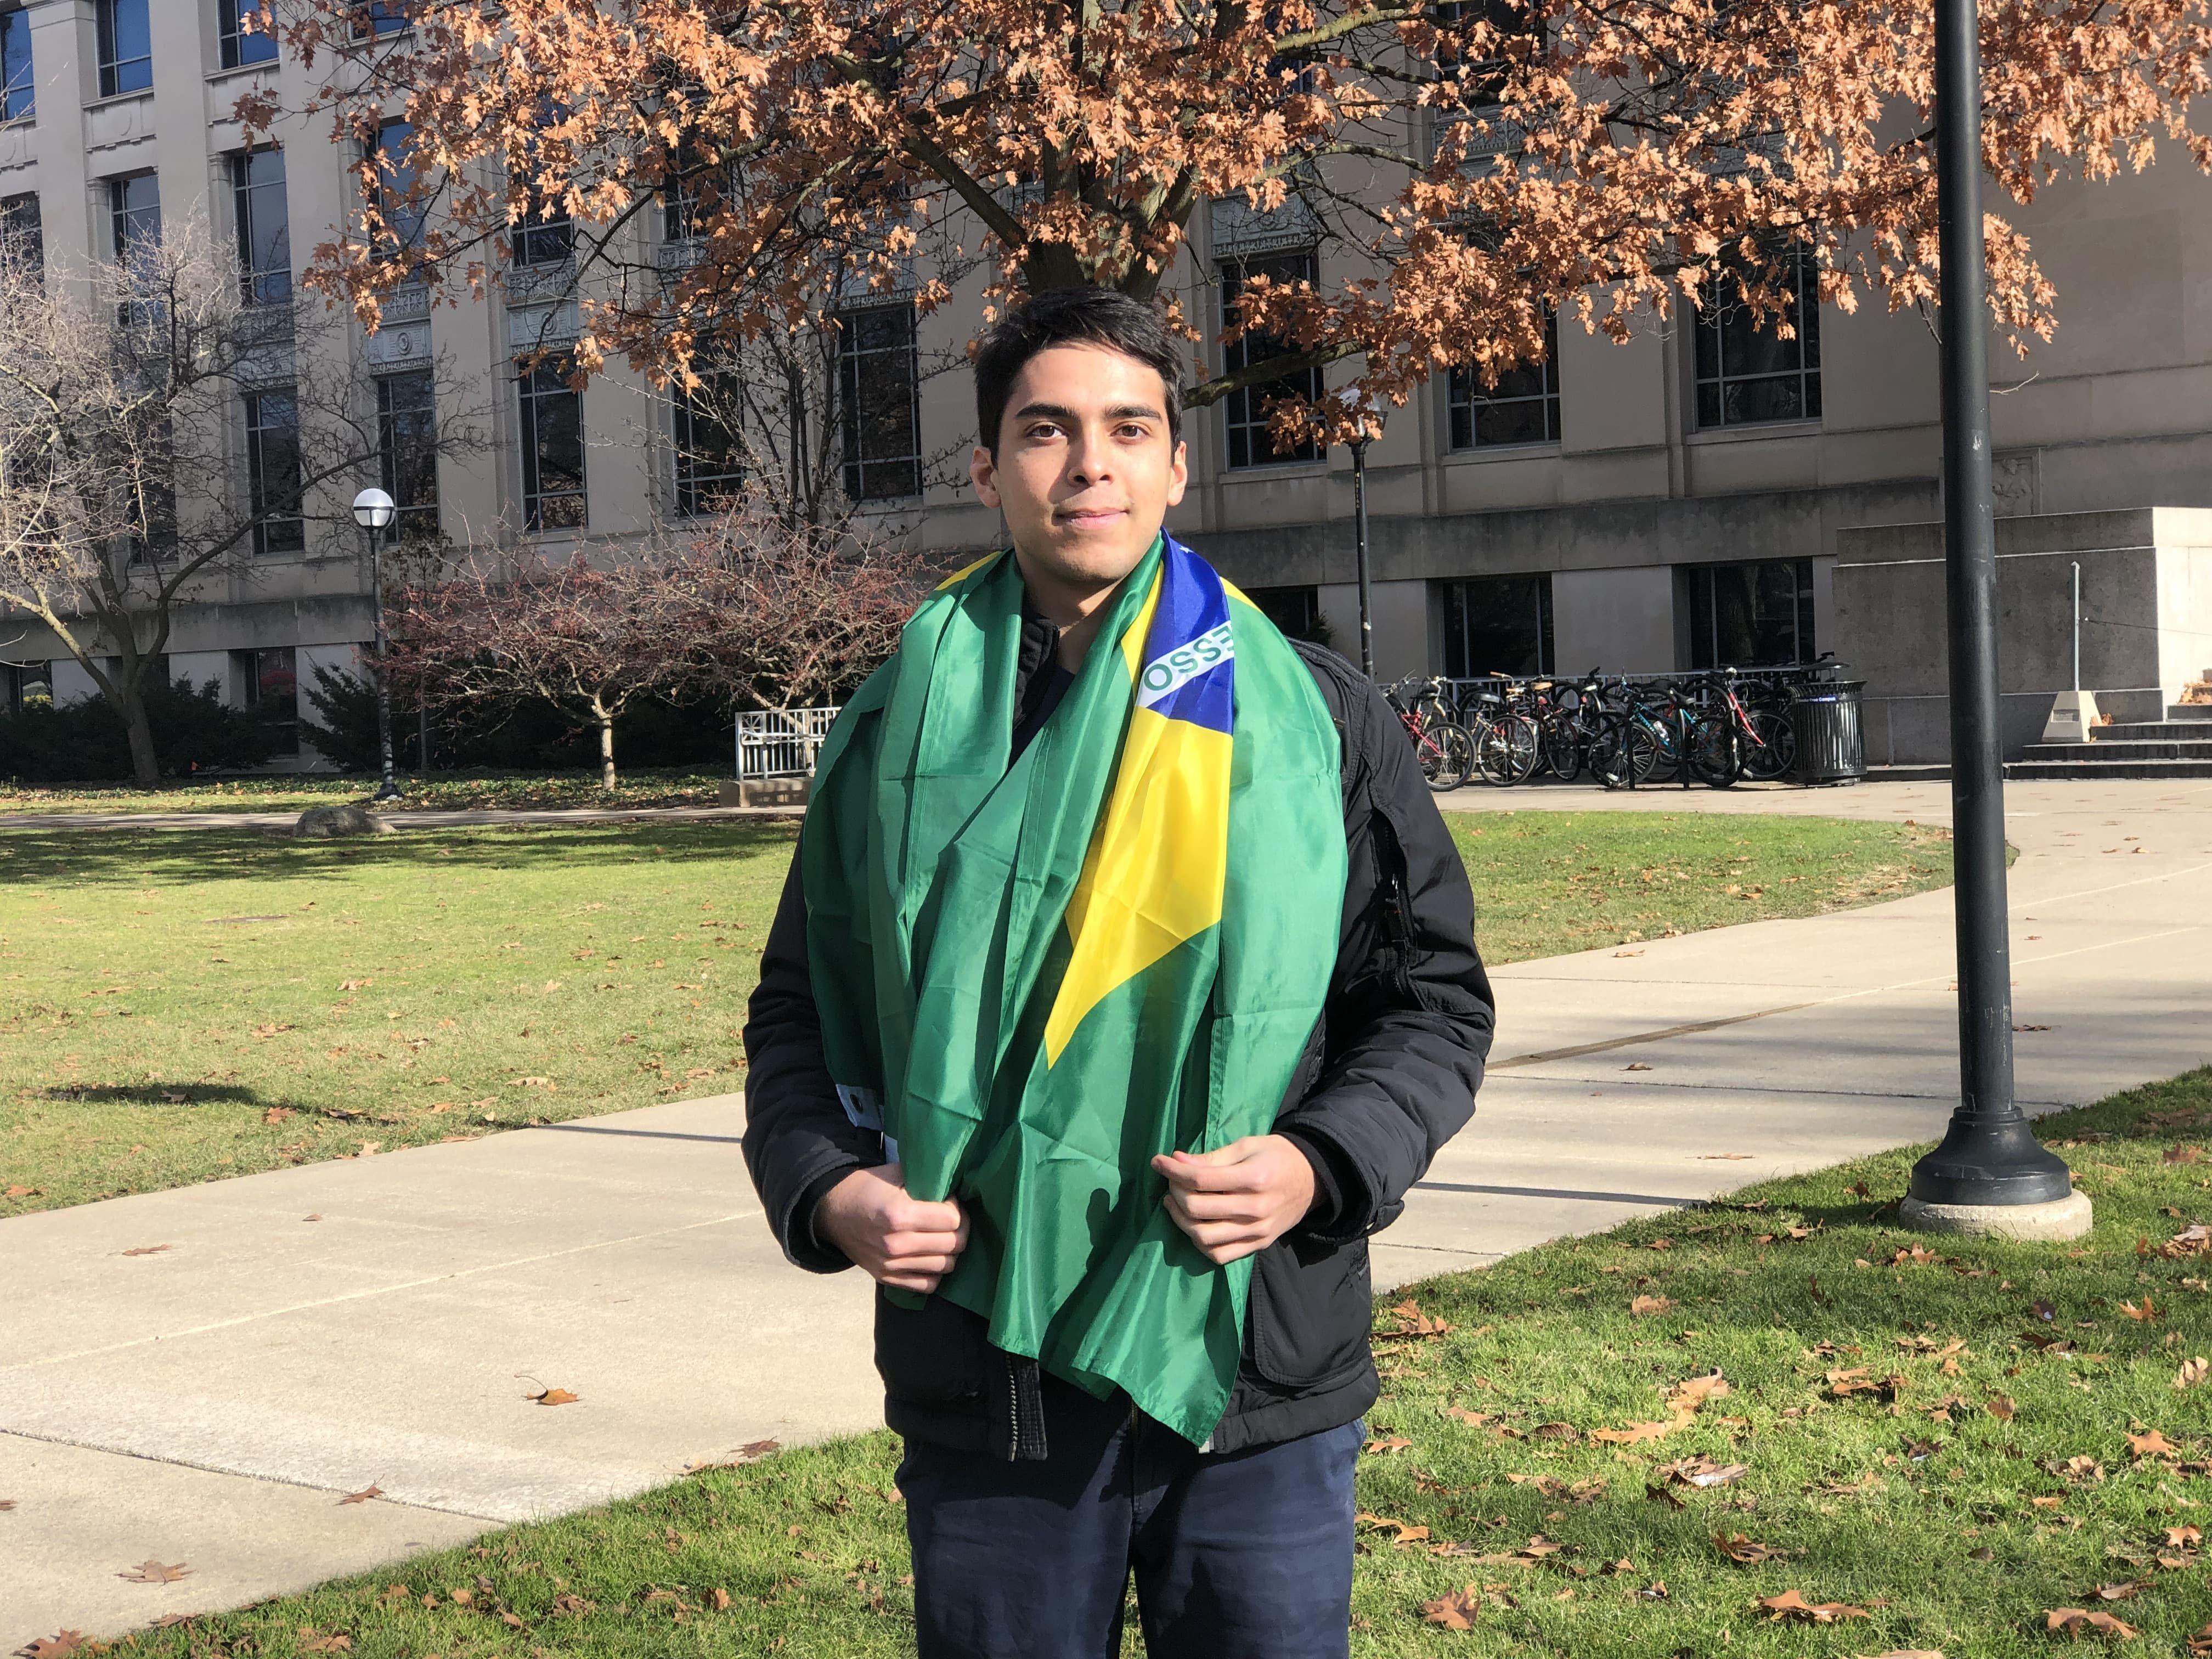 Eduardo Batista with Brazilian flag